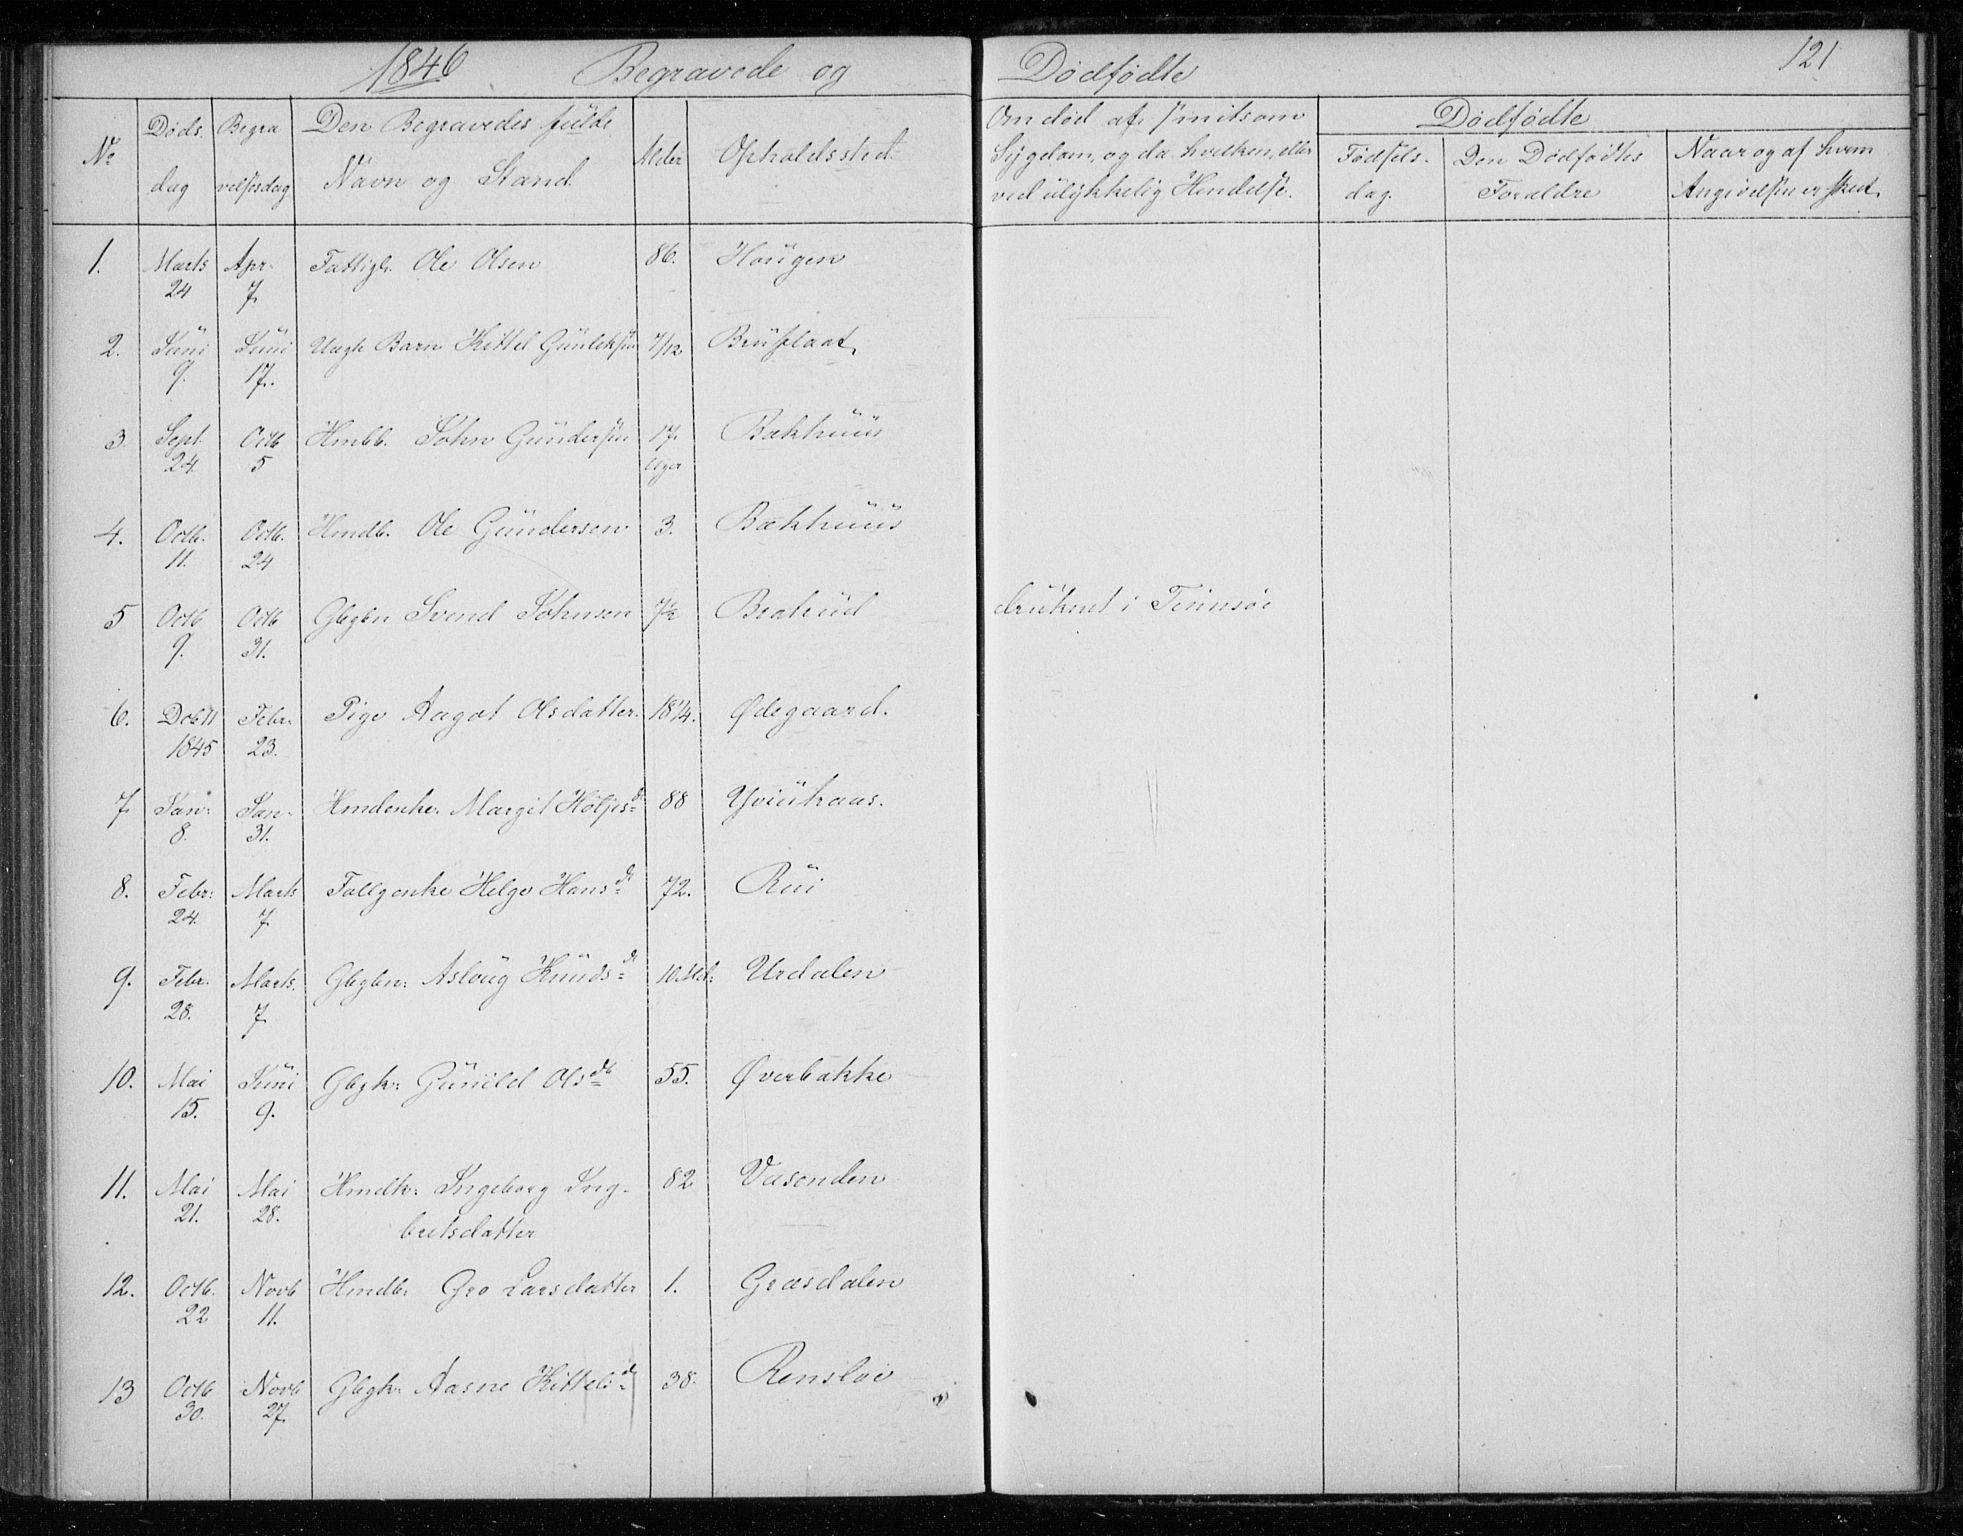 SAKO, Gransherad kirkebøker, F/Fb/L0003: Ministerialbok nr. II 3, 1844-1859, s. 121